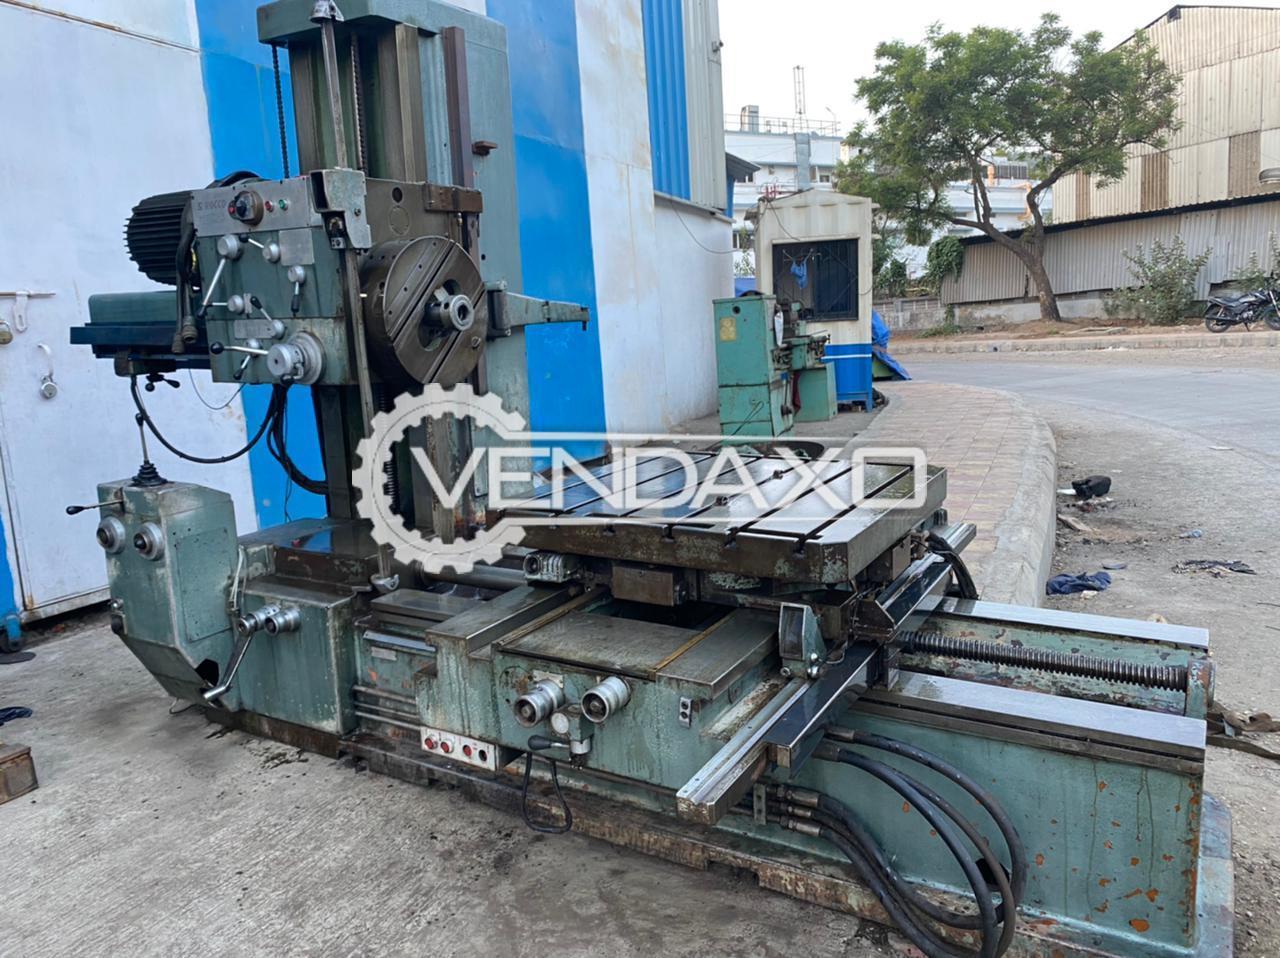 San Rocco Mec 3 Horizontal Boring Machine - Table Size - 920 x 920 mm